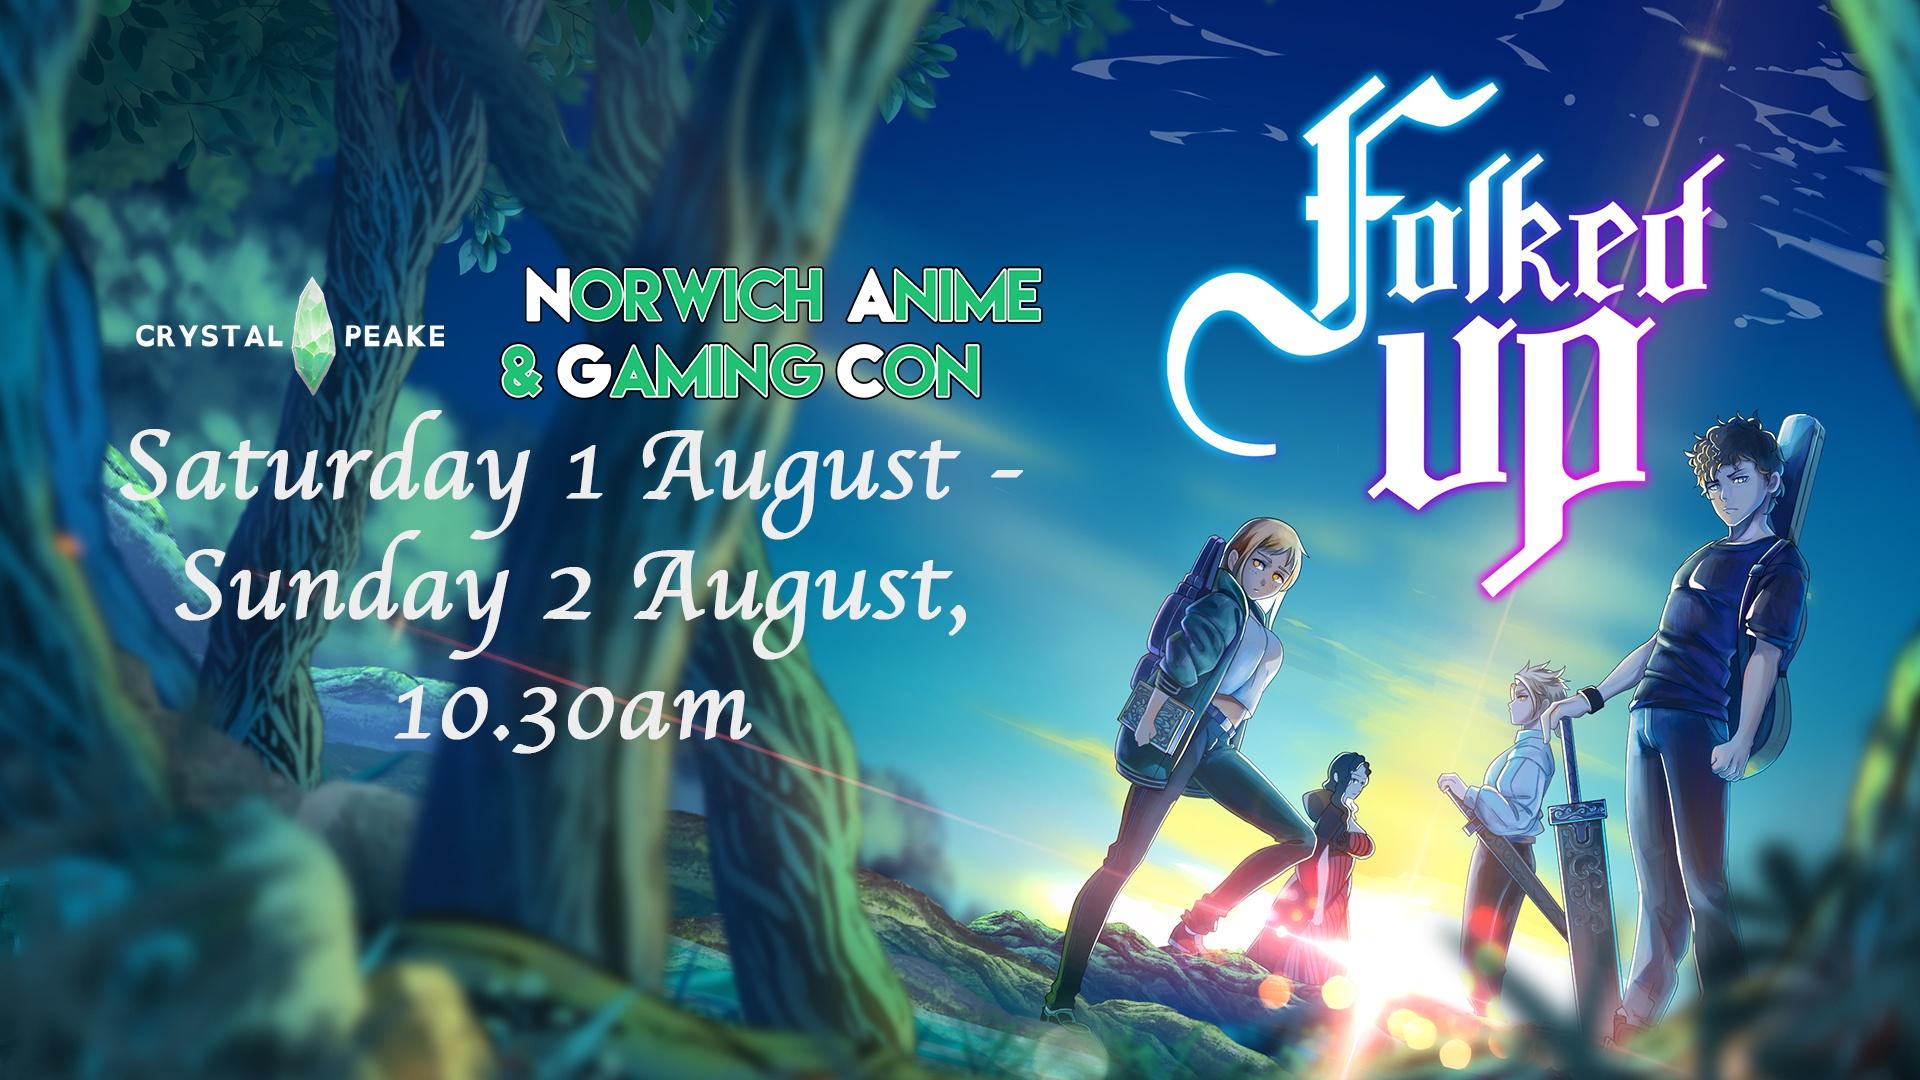 Norwich Anime & Gaming Con